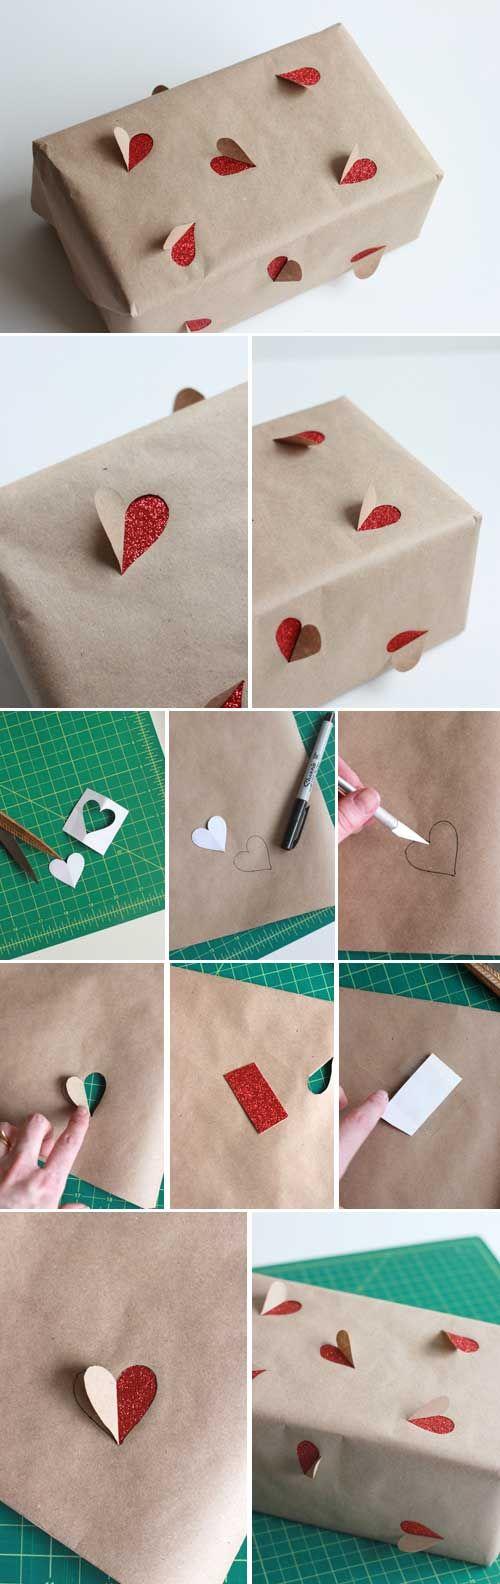 cadeau-inpakken-origineel